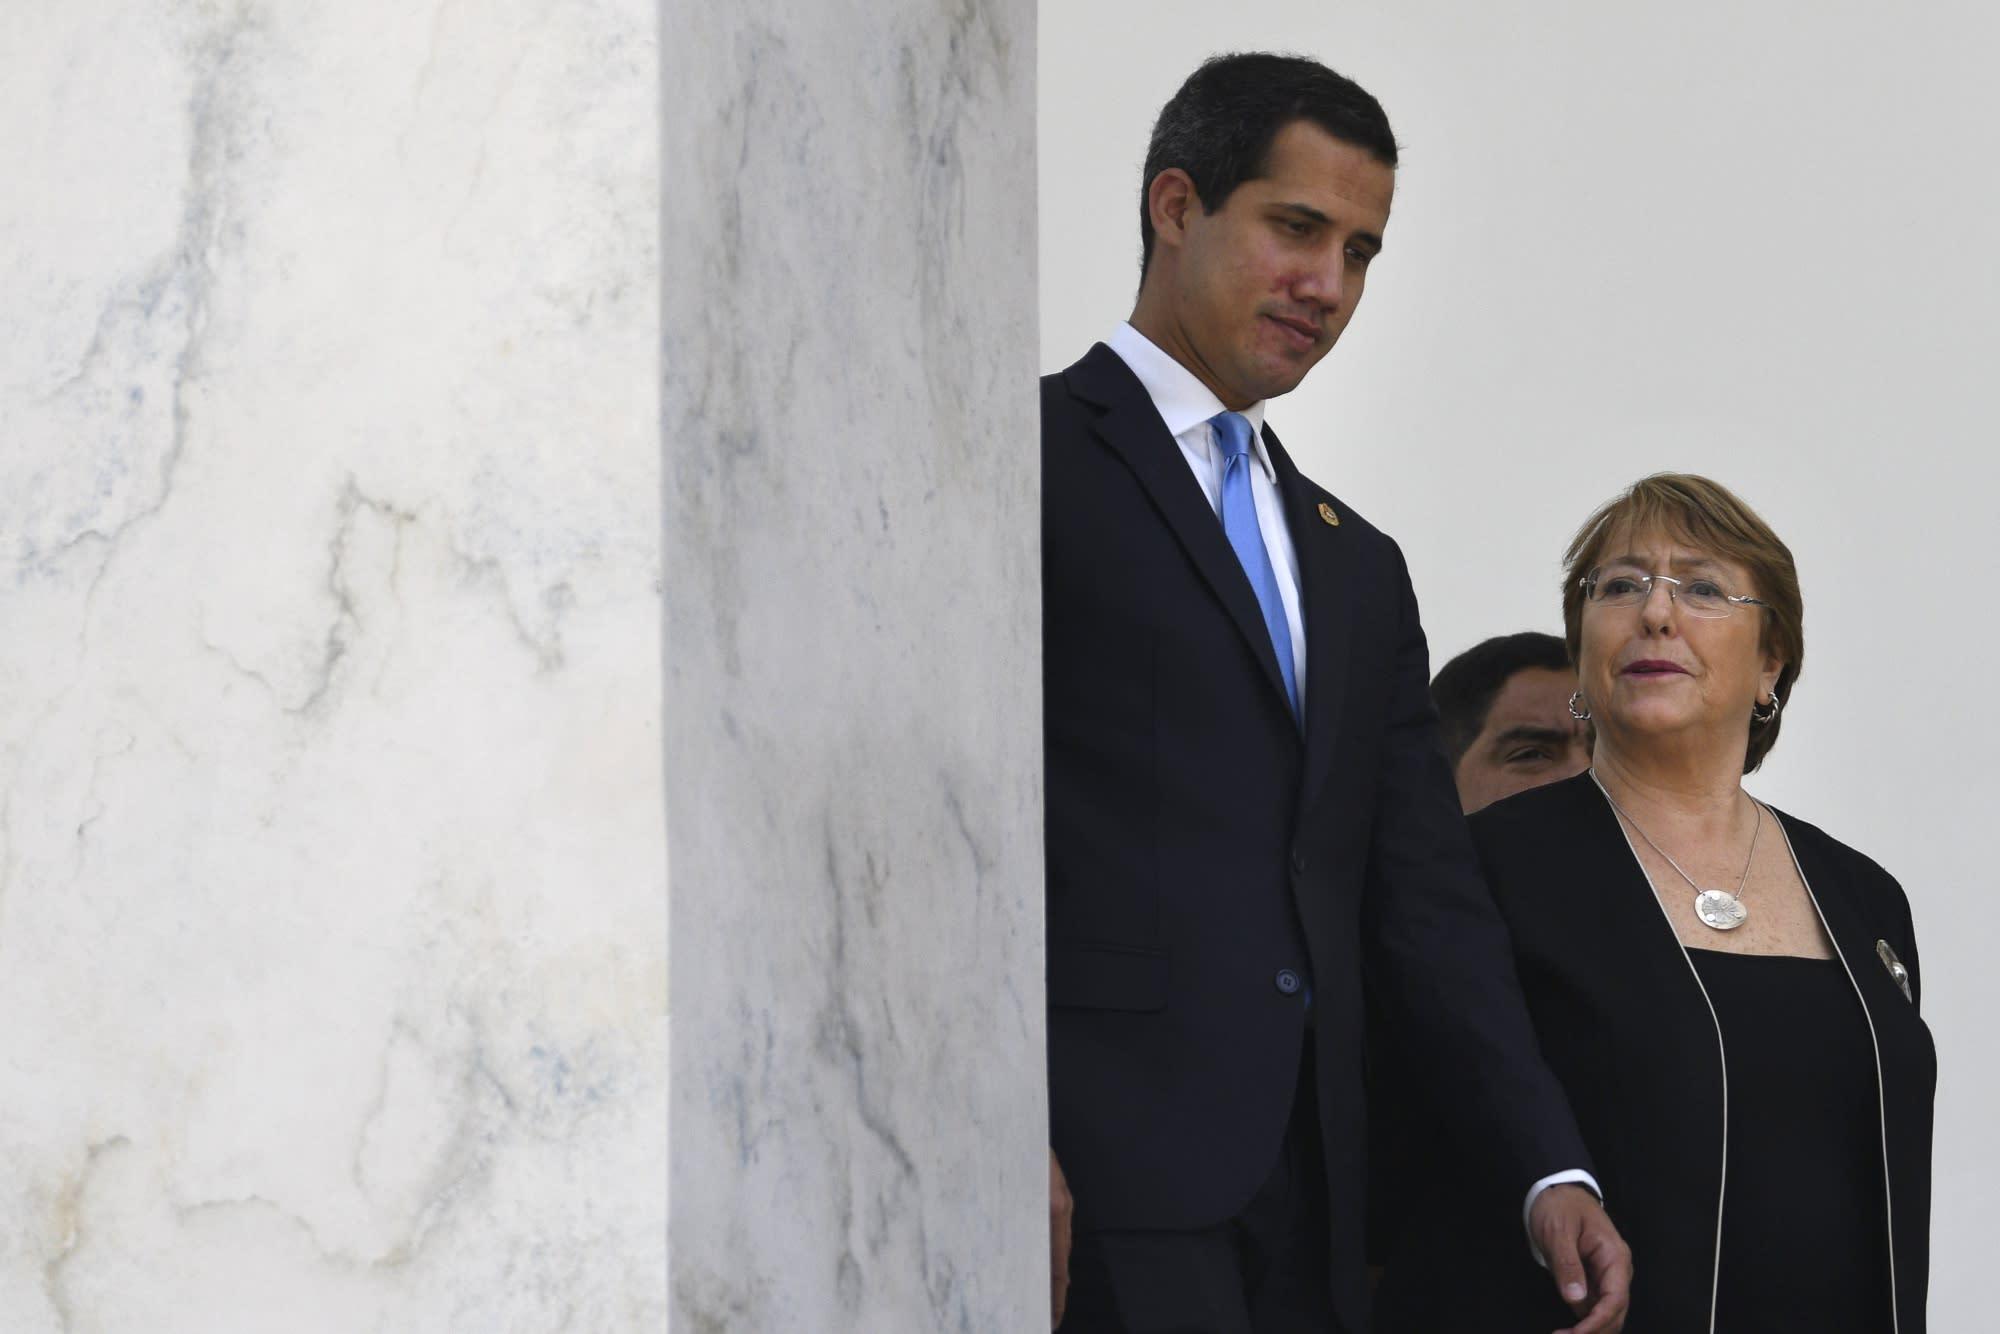 Protests Erupt in Caracas During Venezuela Visit by UN's Bachelet